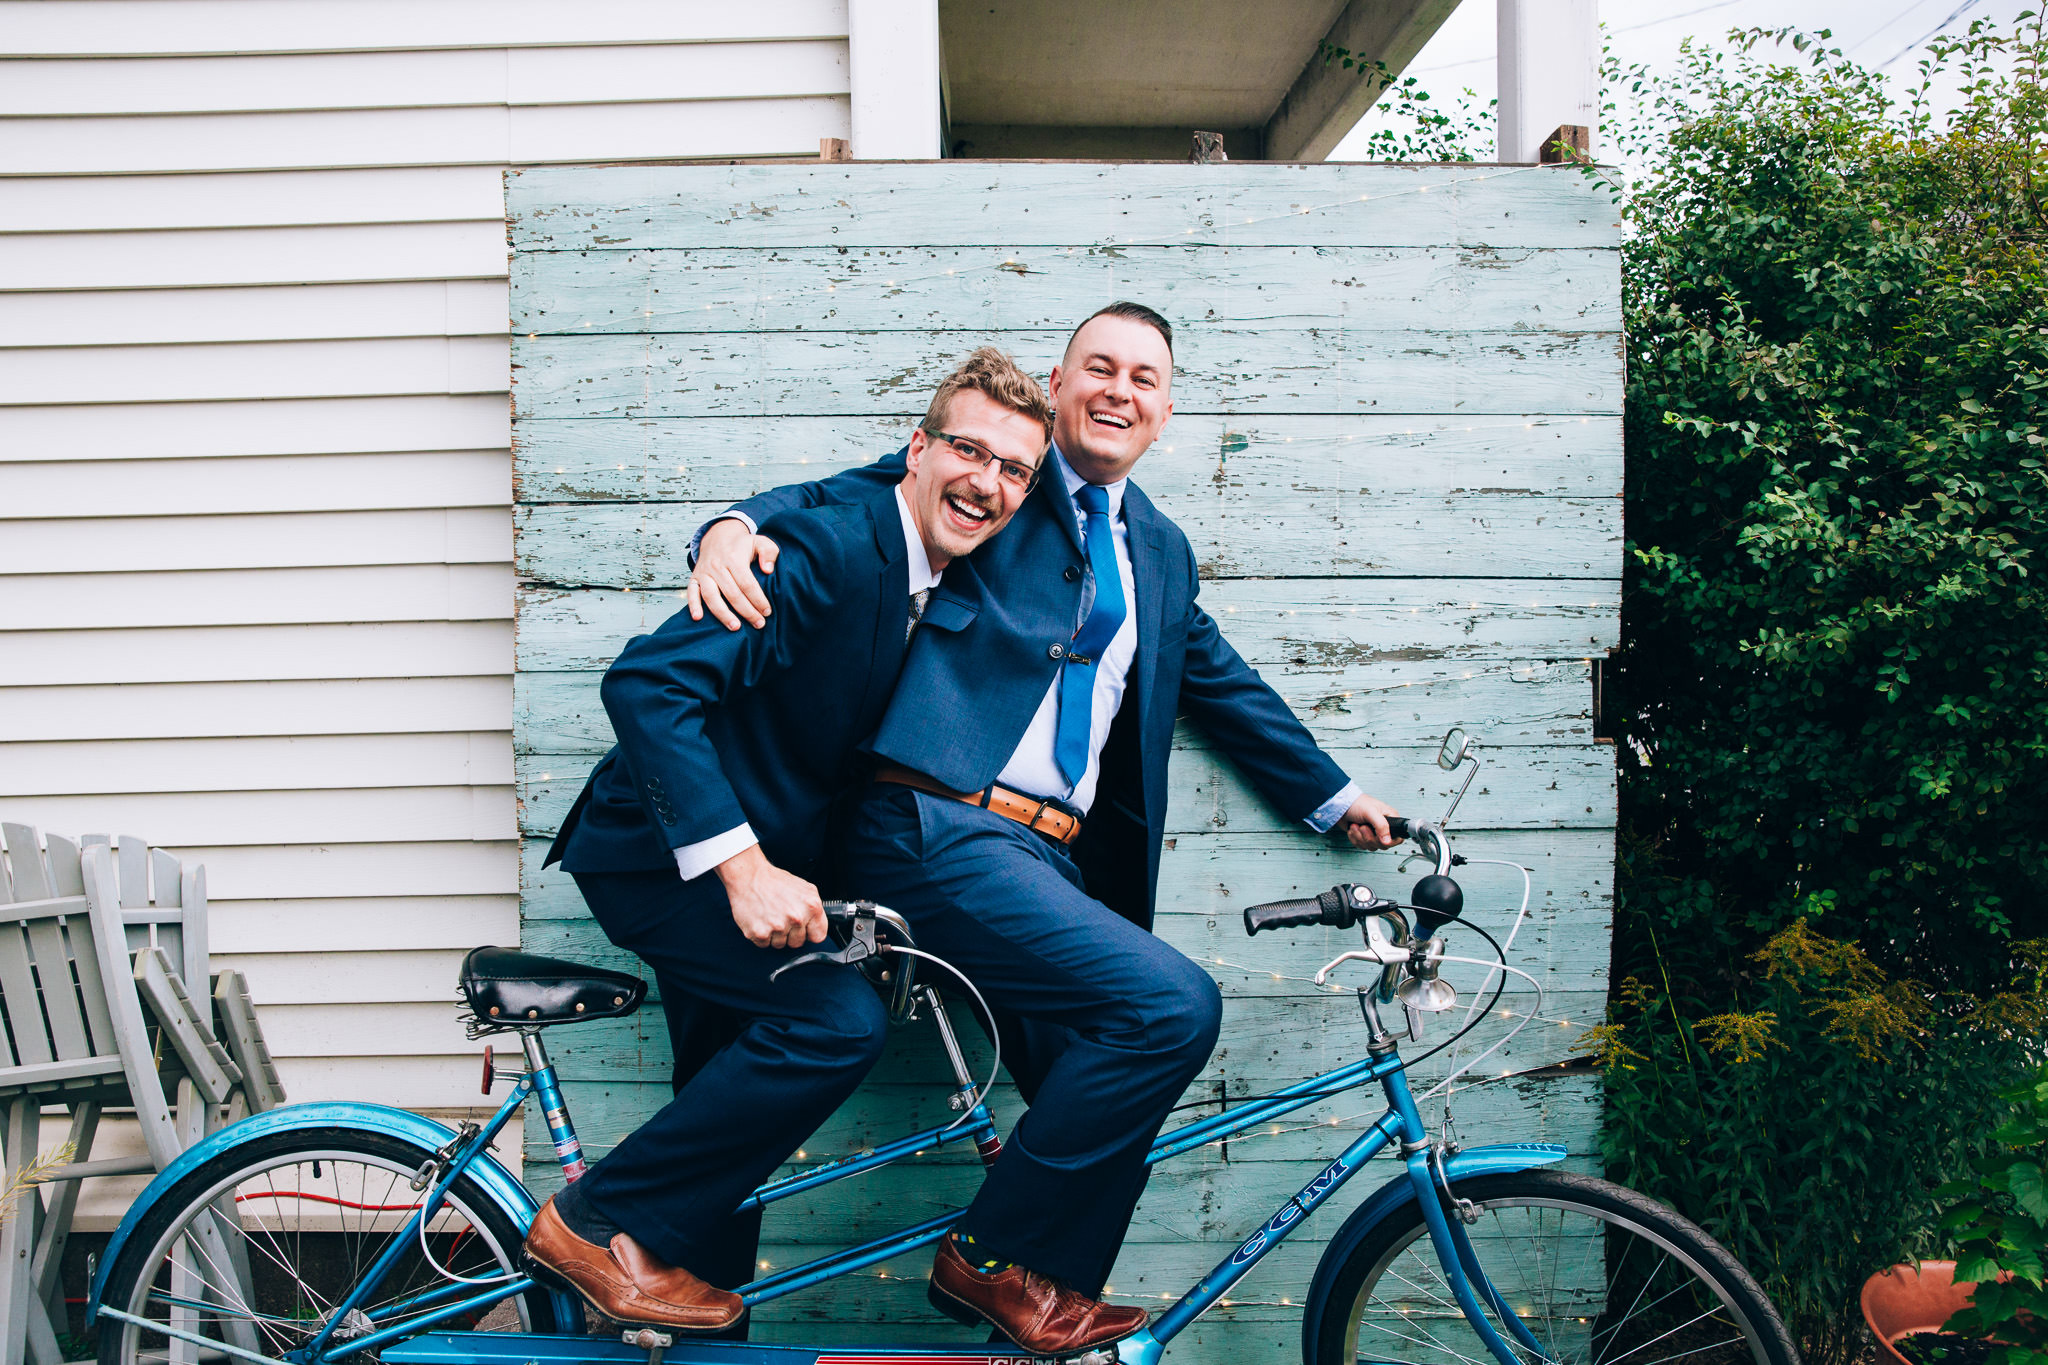 054_Canada-documentary-wedding-photograp